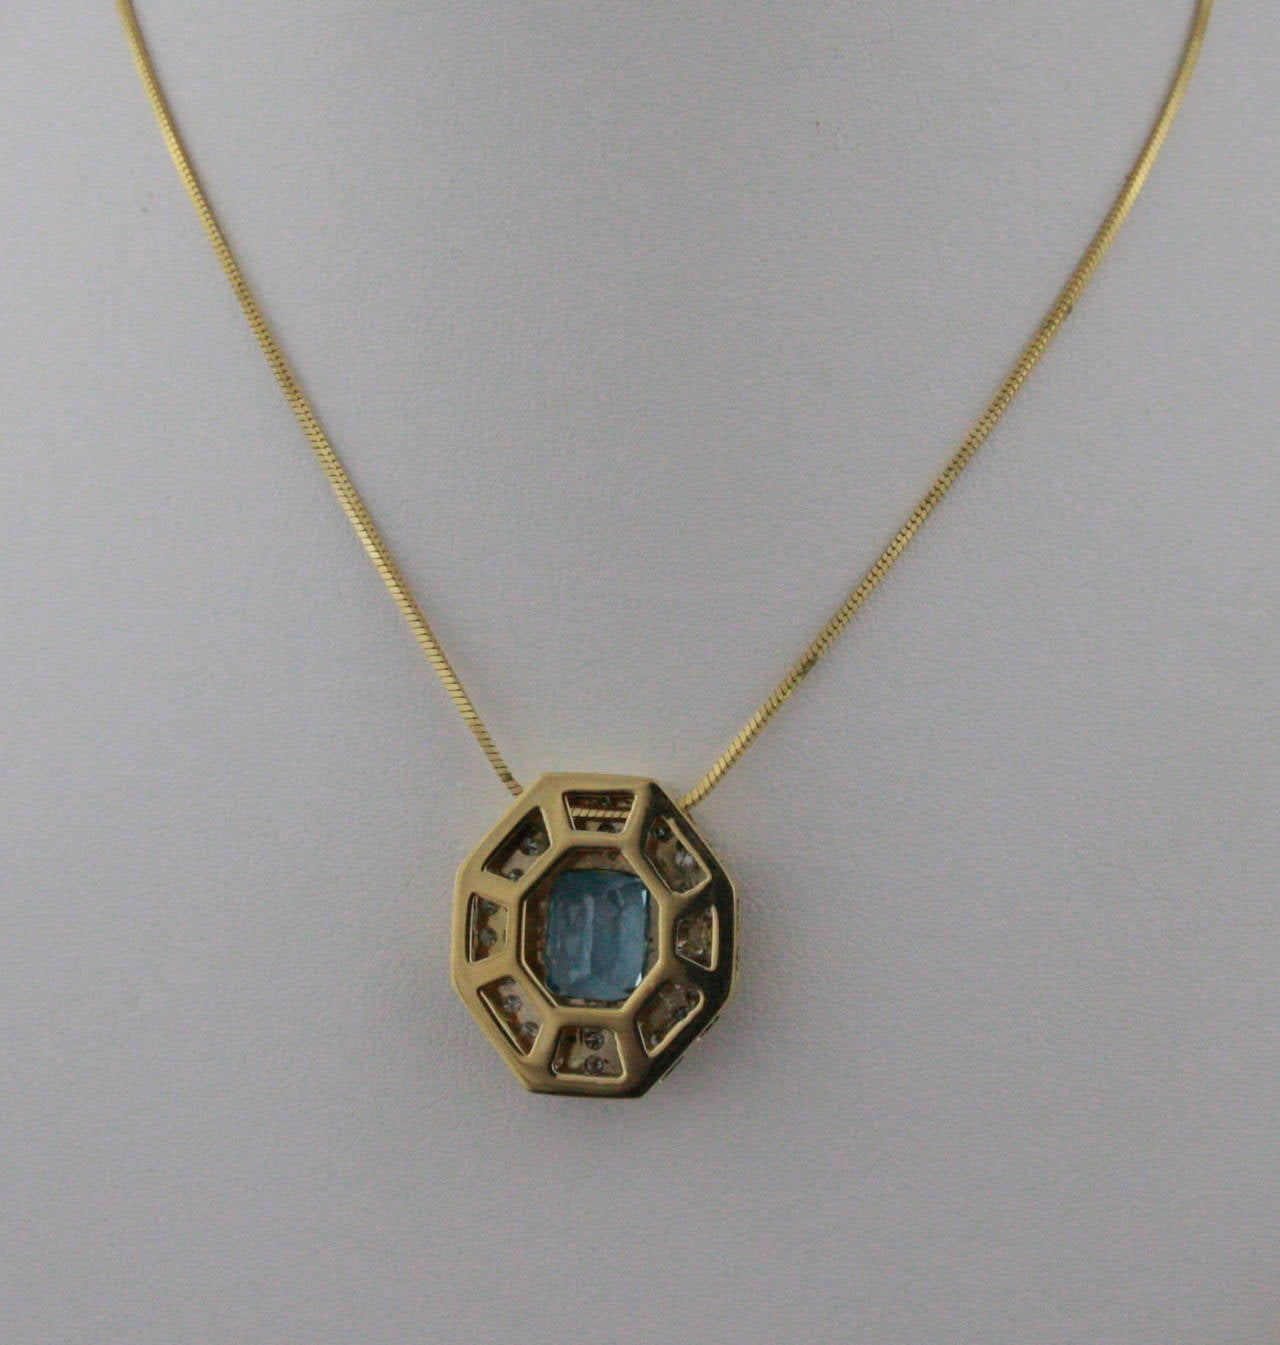 5.5 Carat Aquamarine & Diamond Gold Pendant Necklace For Sale 1